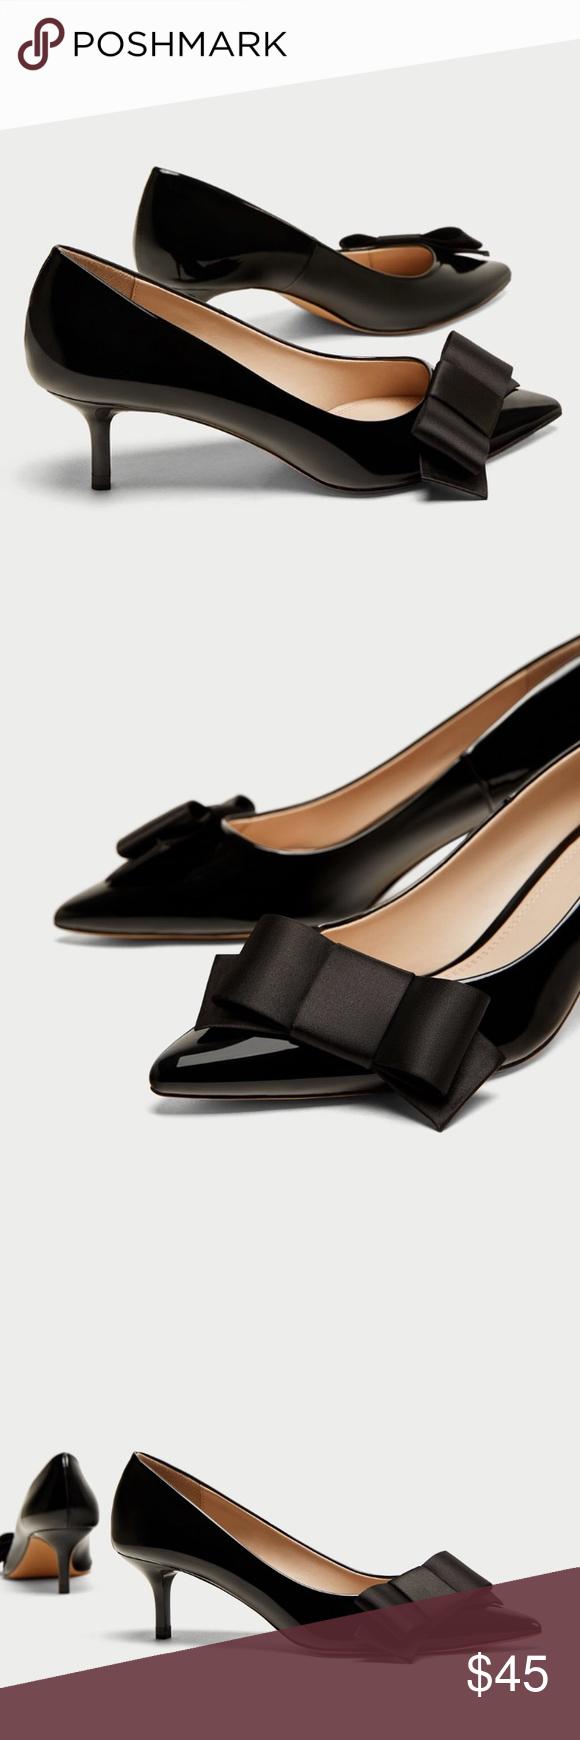 Zara Court Shoes With Bow Kitten Heels Shoes Women Heels Zara Black